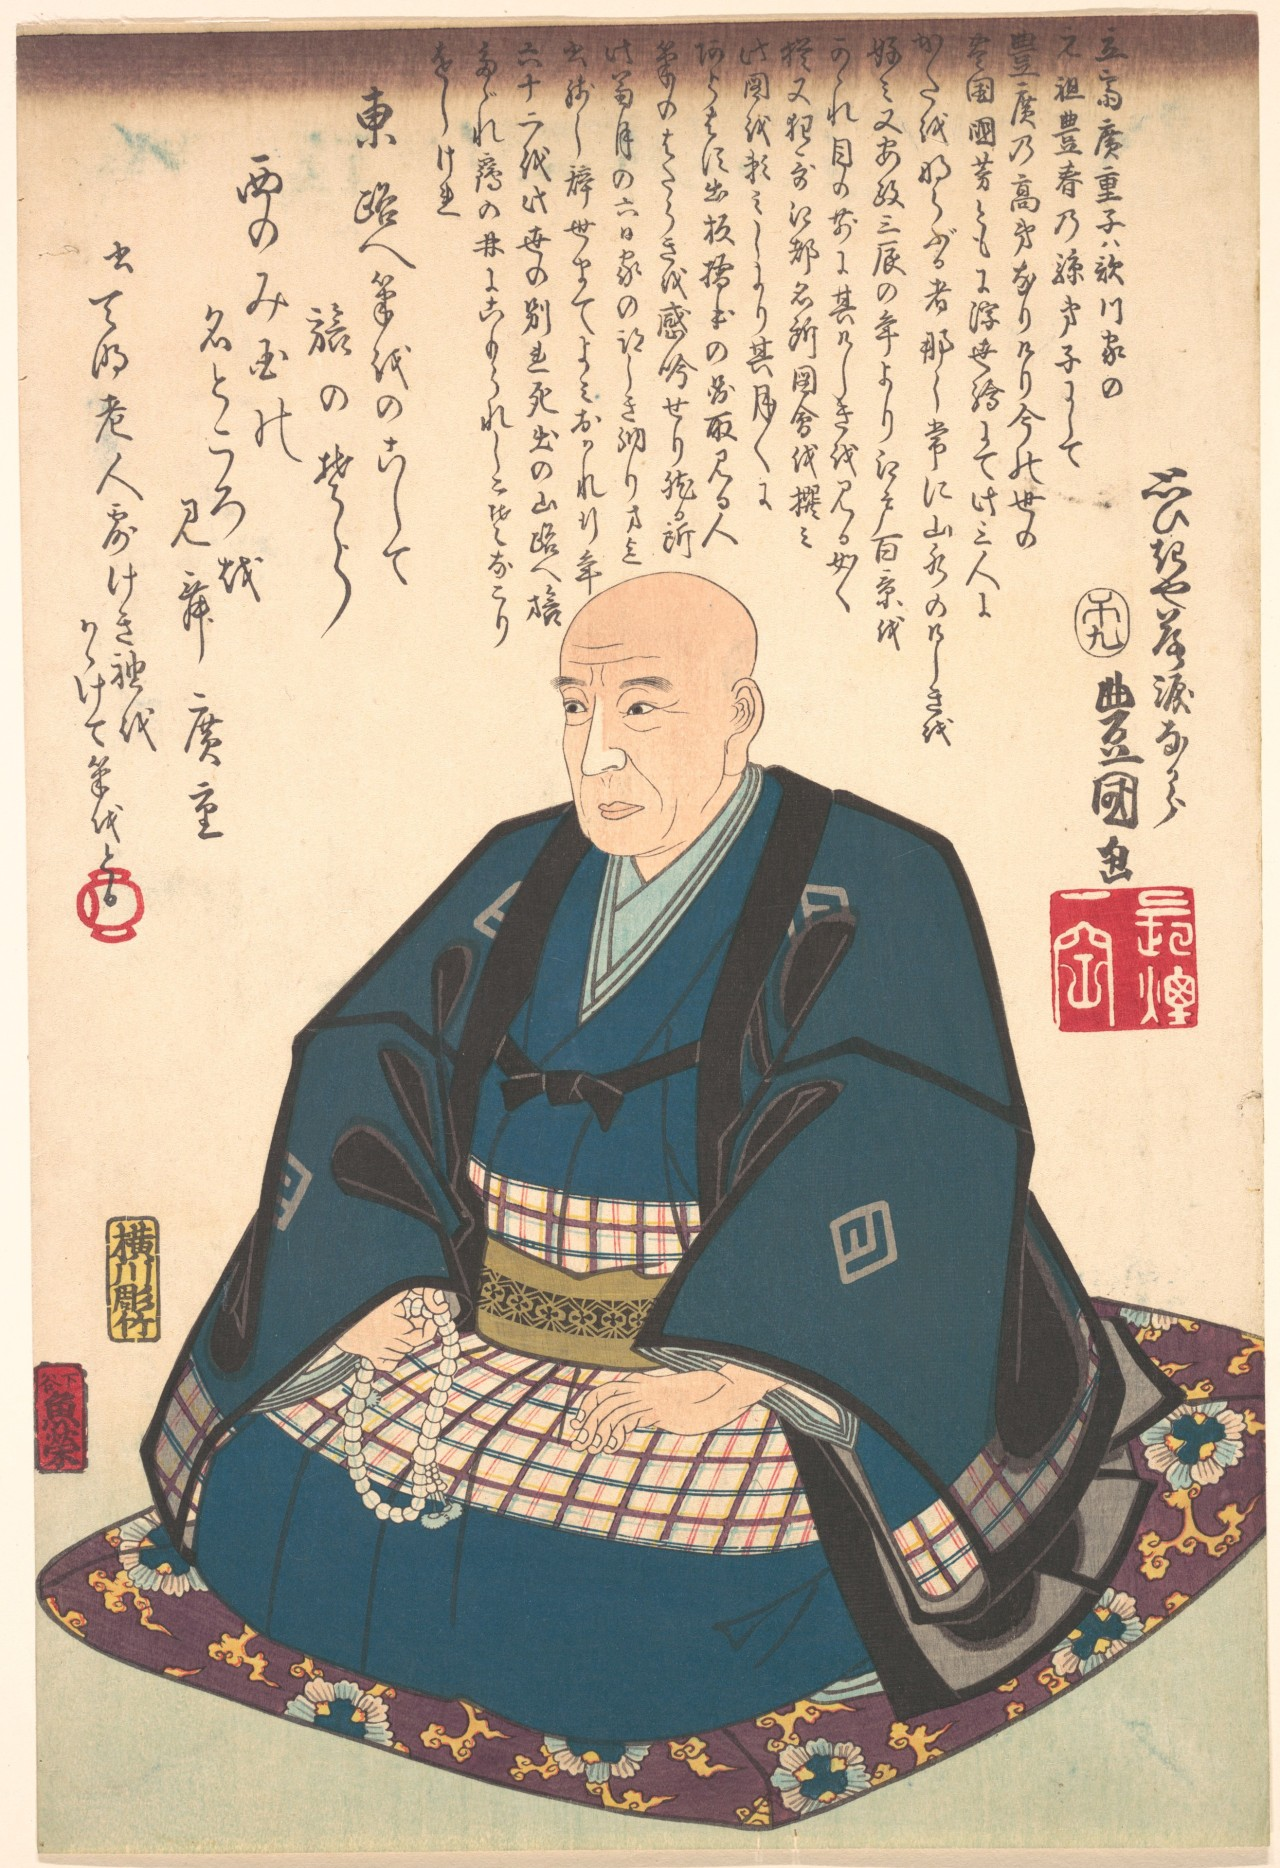 memorial_portrait_of_hiroshige2c_by_kunisada